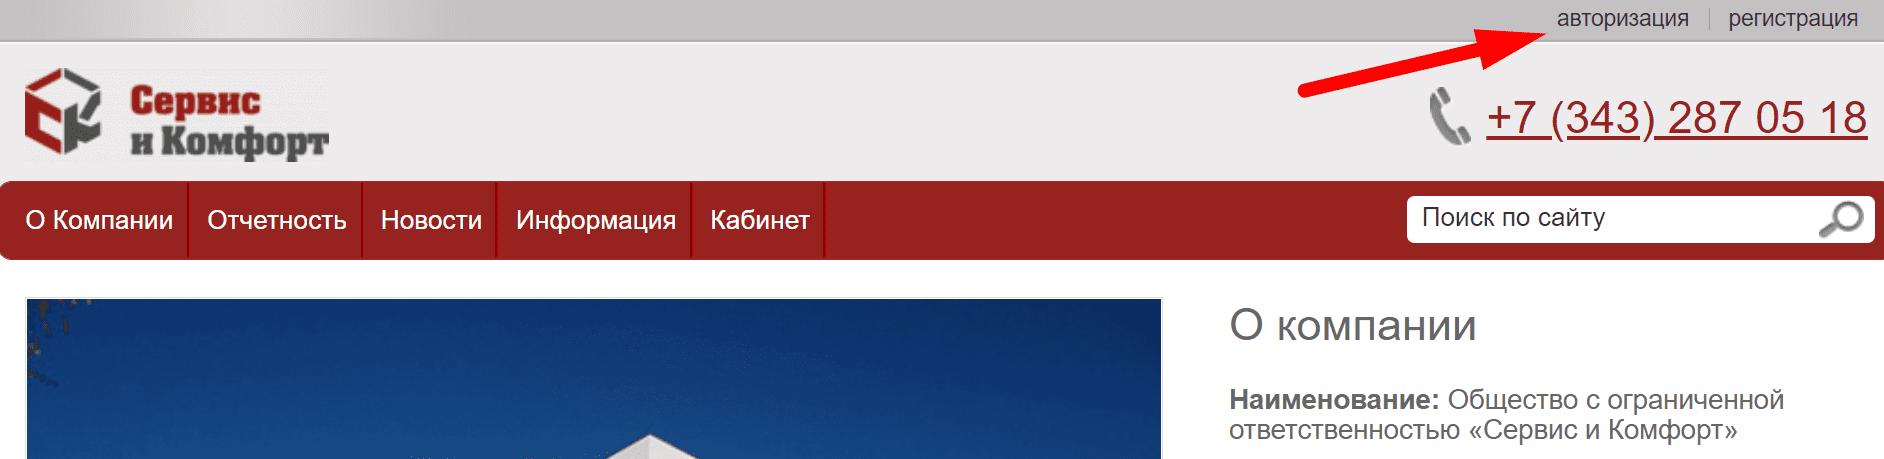 Ссылка на сайт компании «Сервис и комфорт»